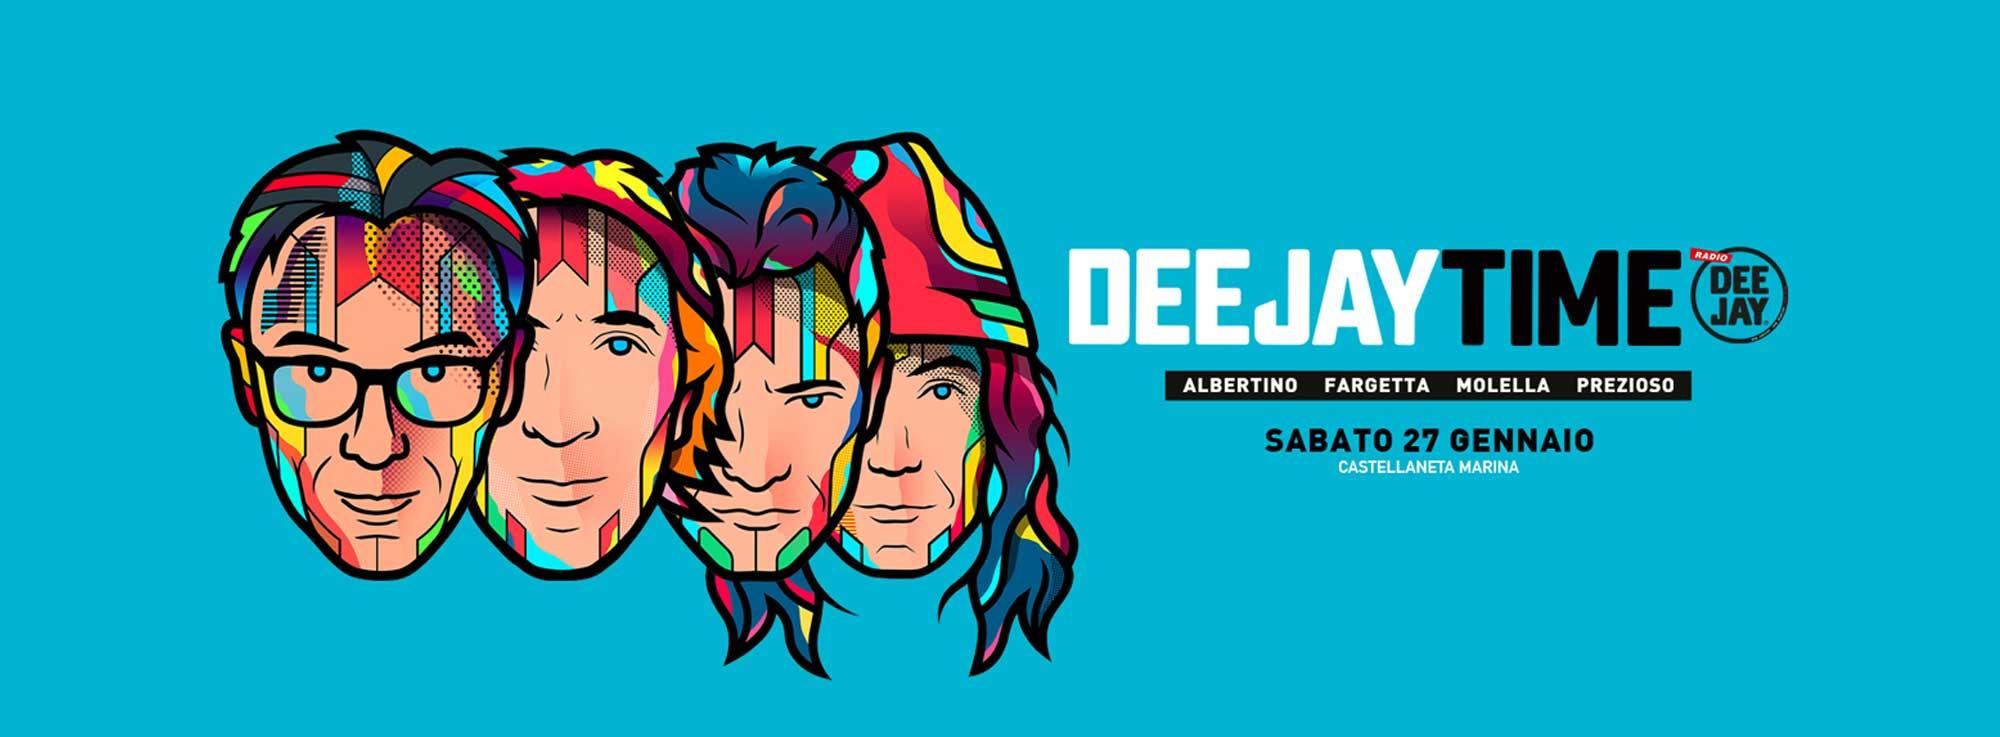 Castellaneta Marina: Deejay Time Reunion